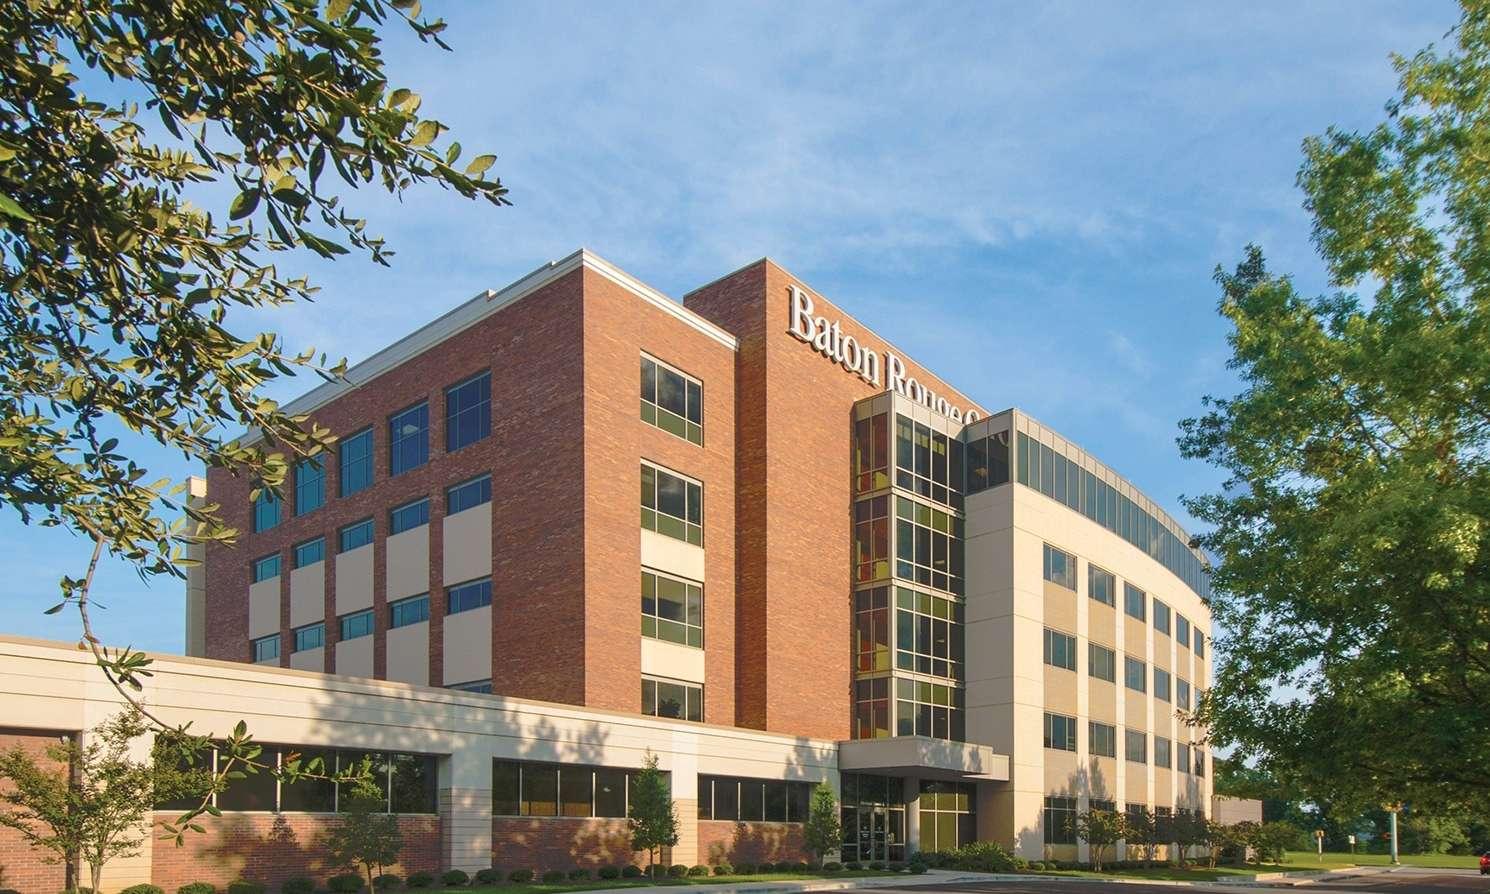 Baton Rouge General Medical Center Office Building Physicians Entrance